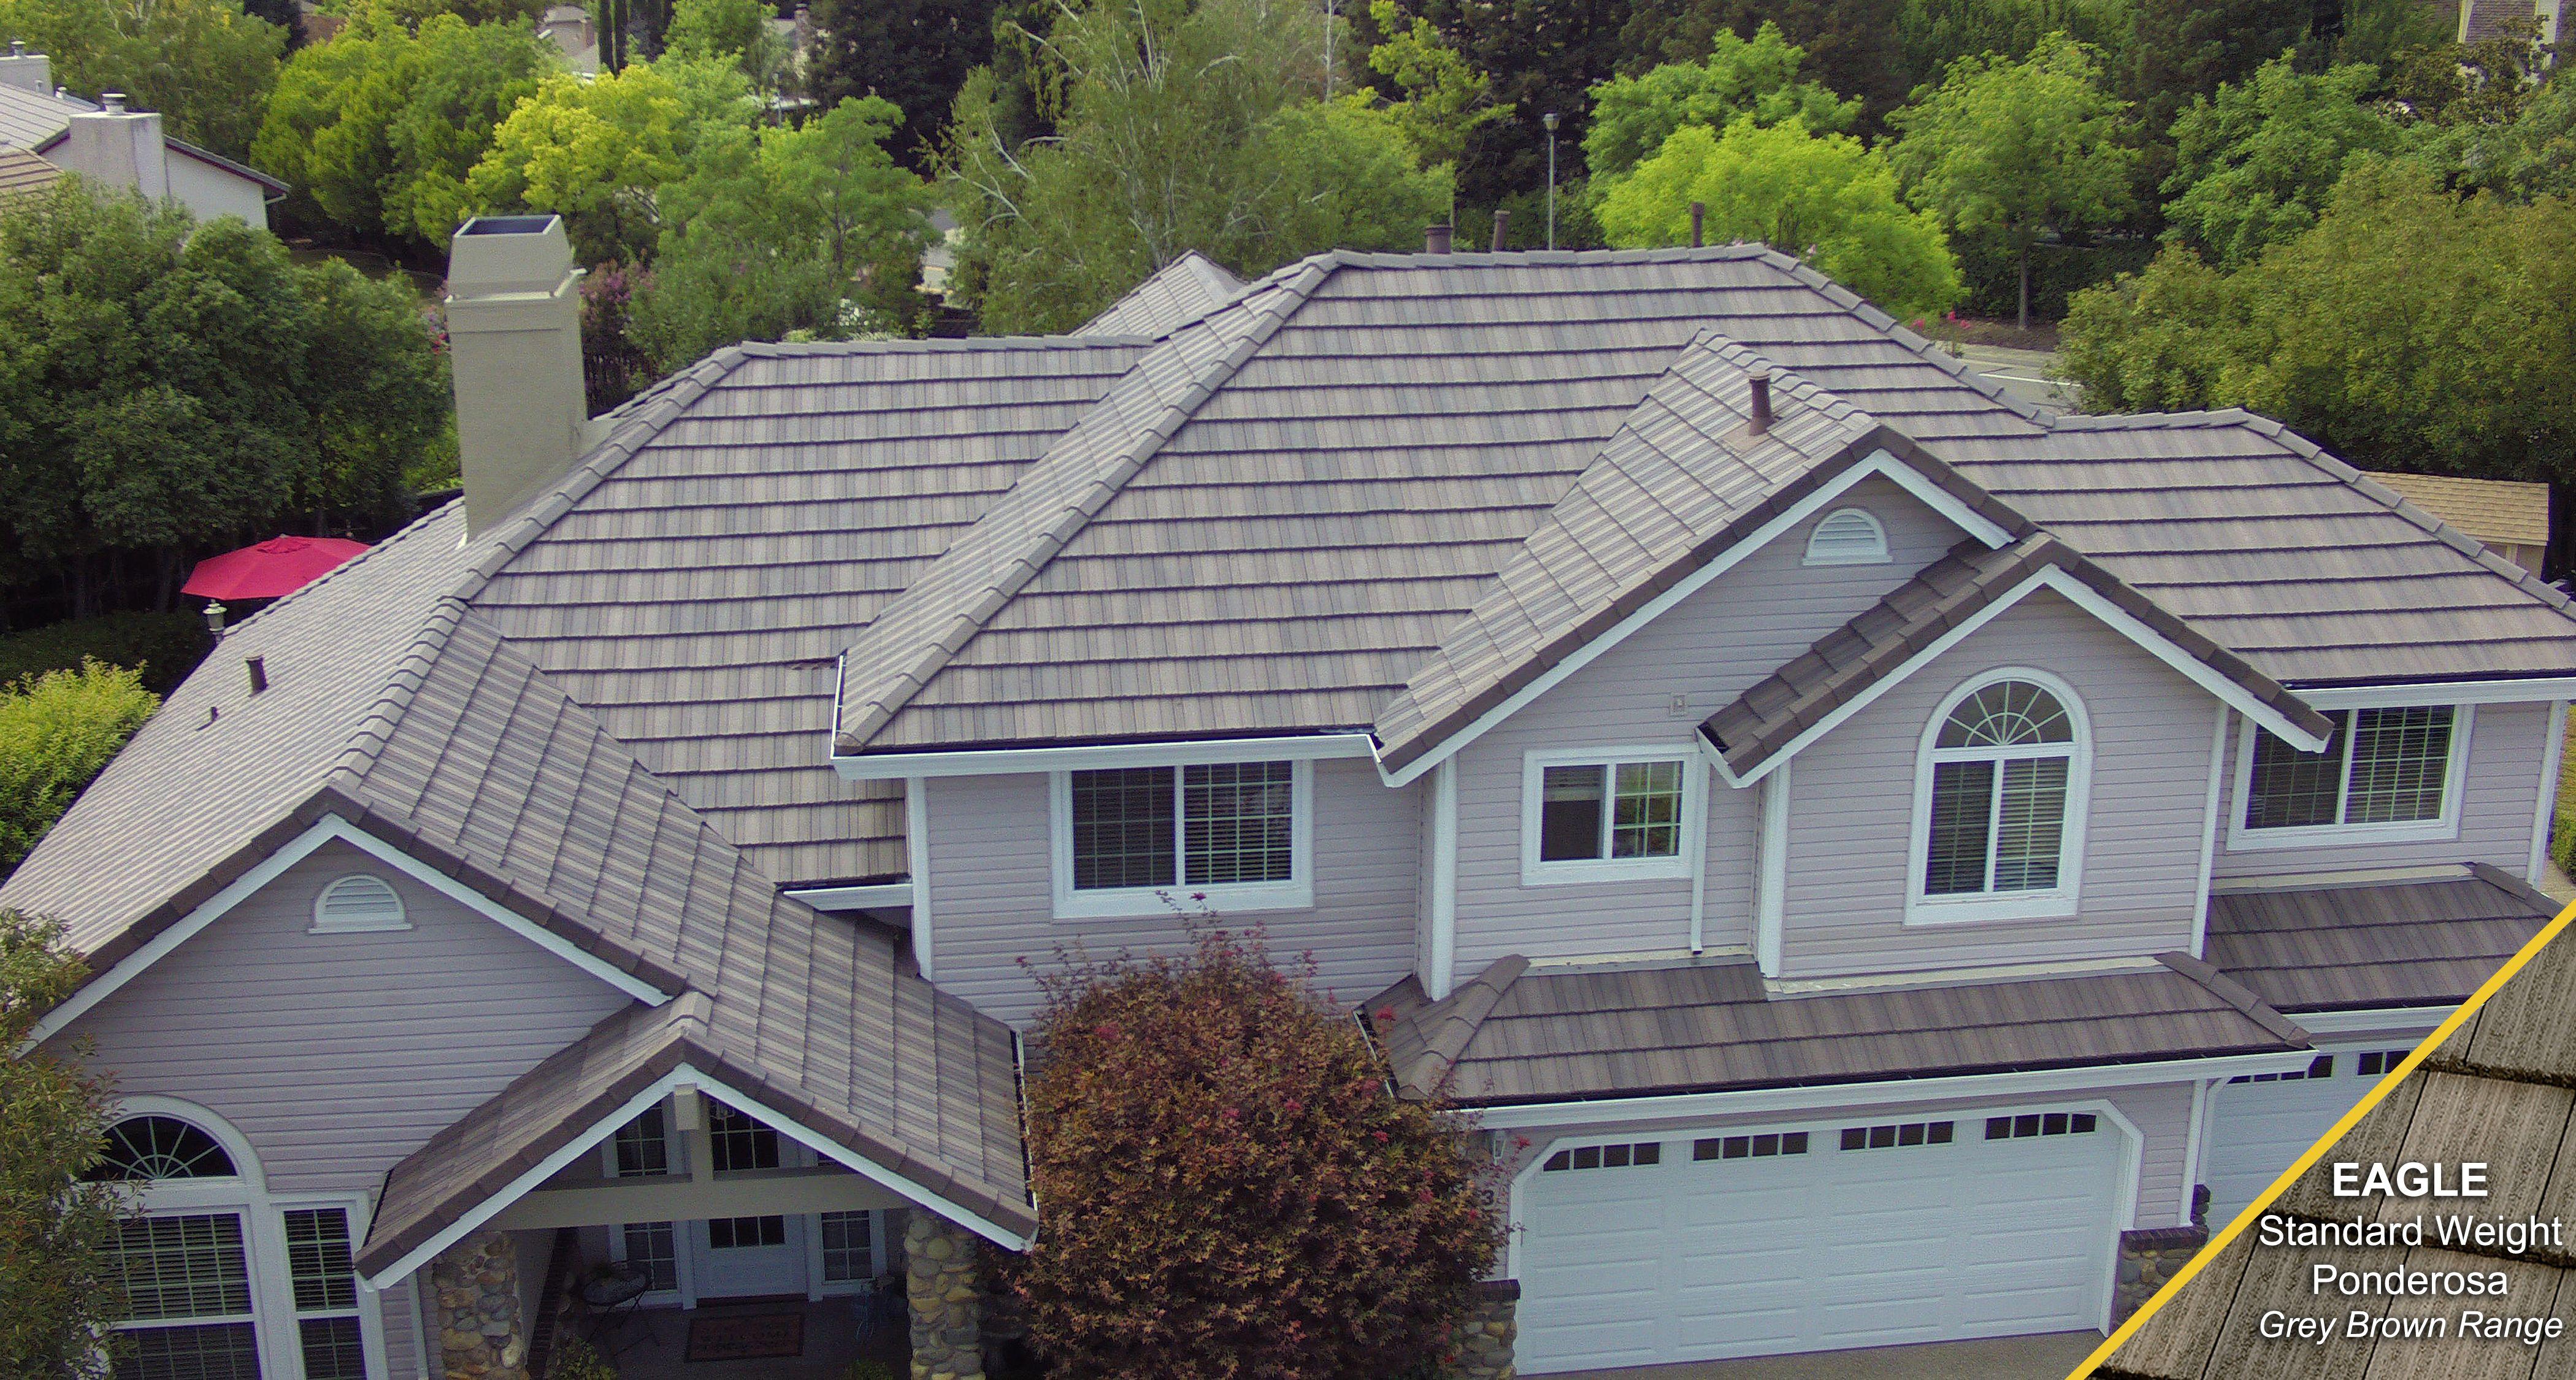 Type Concrete Tile Manufacturer Eagle Profile Ponderosa Color Grey Brown Range Concrete Roof Tiles Roof Installation Roof Tiles